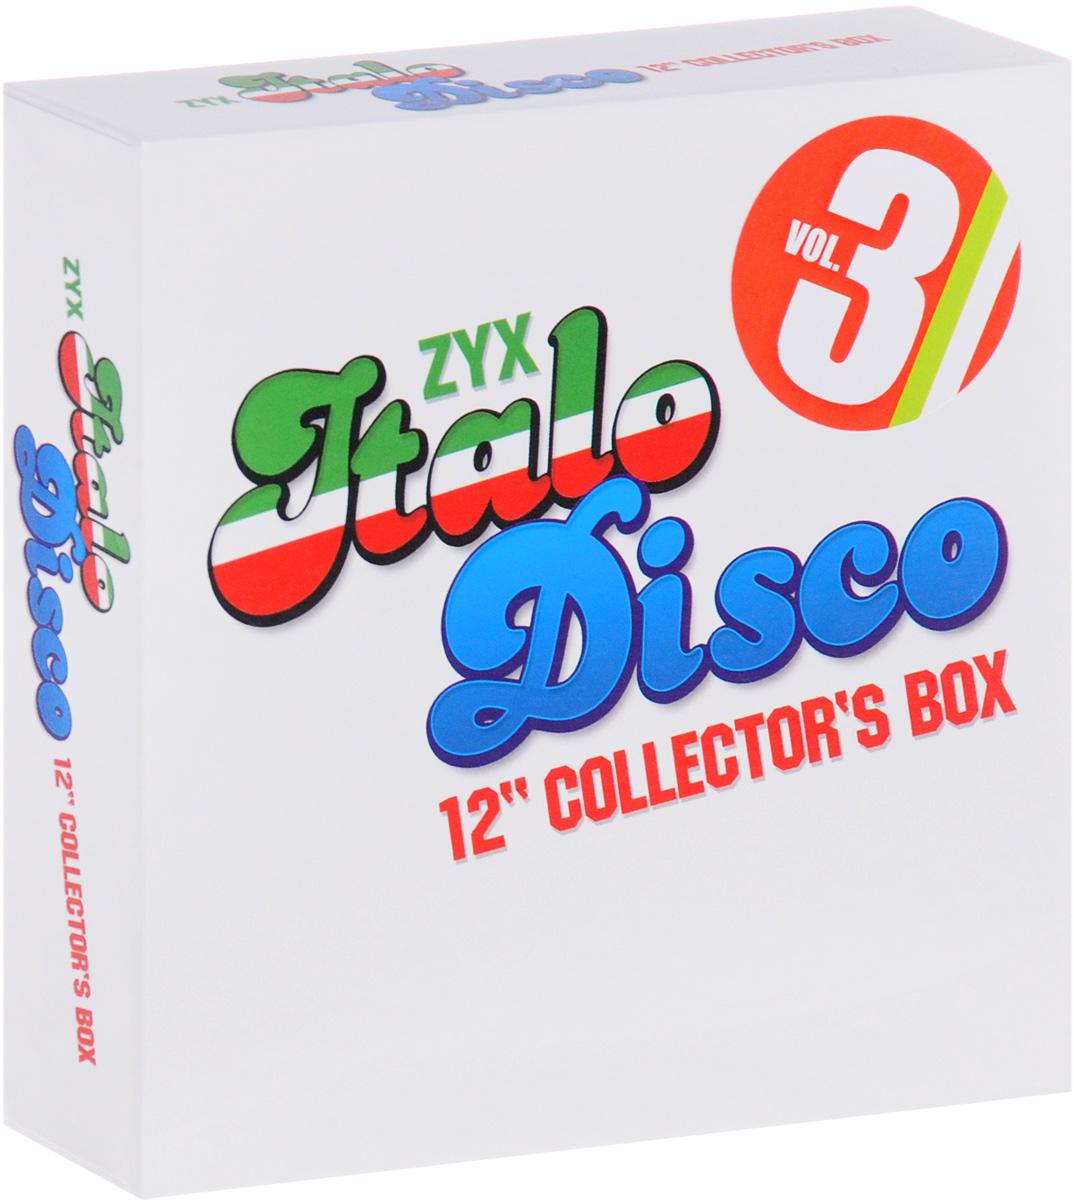 Грант Миллер,Валери Доре,Savage,Tango,Алан Росс,Koto,50 & 50 Brothers,Brando,Сильвер Поццоли,Майк Мэрин ZYX Italo Disco. 12 Collector's Box. Vol. 3 (10 CD) italo disco collection 12 3 cd